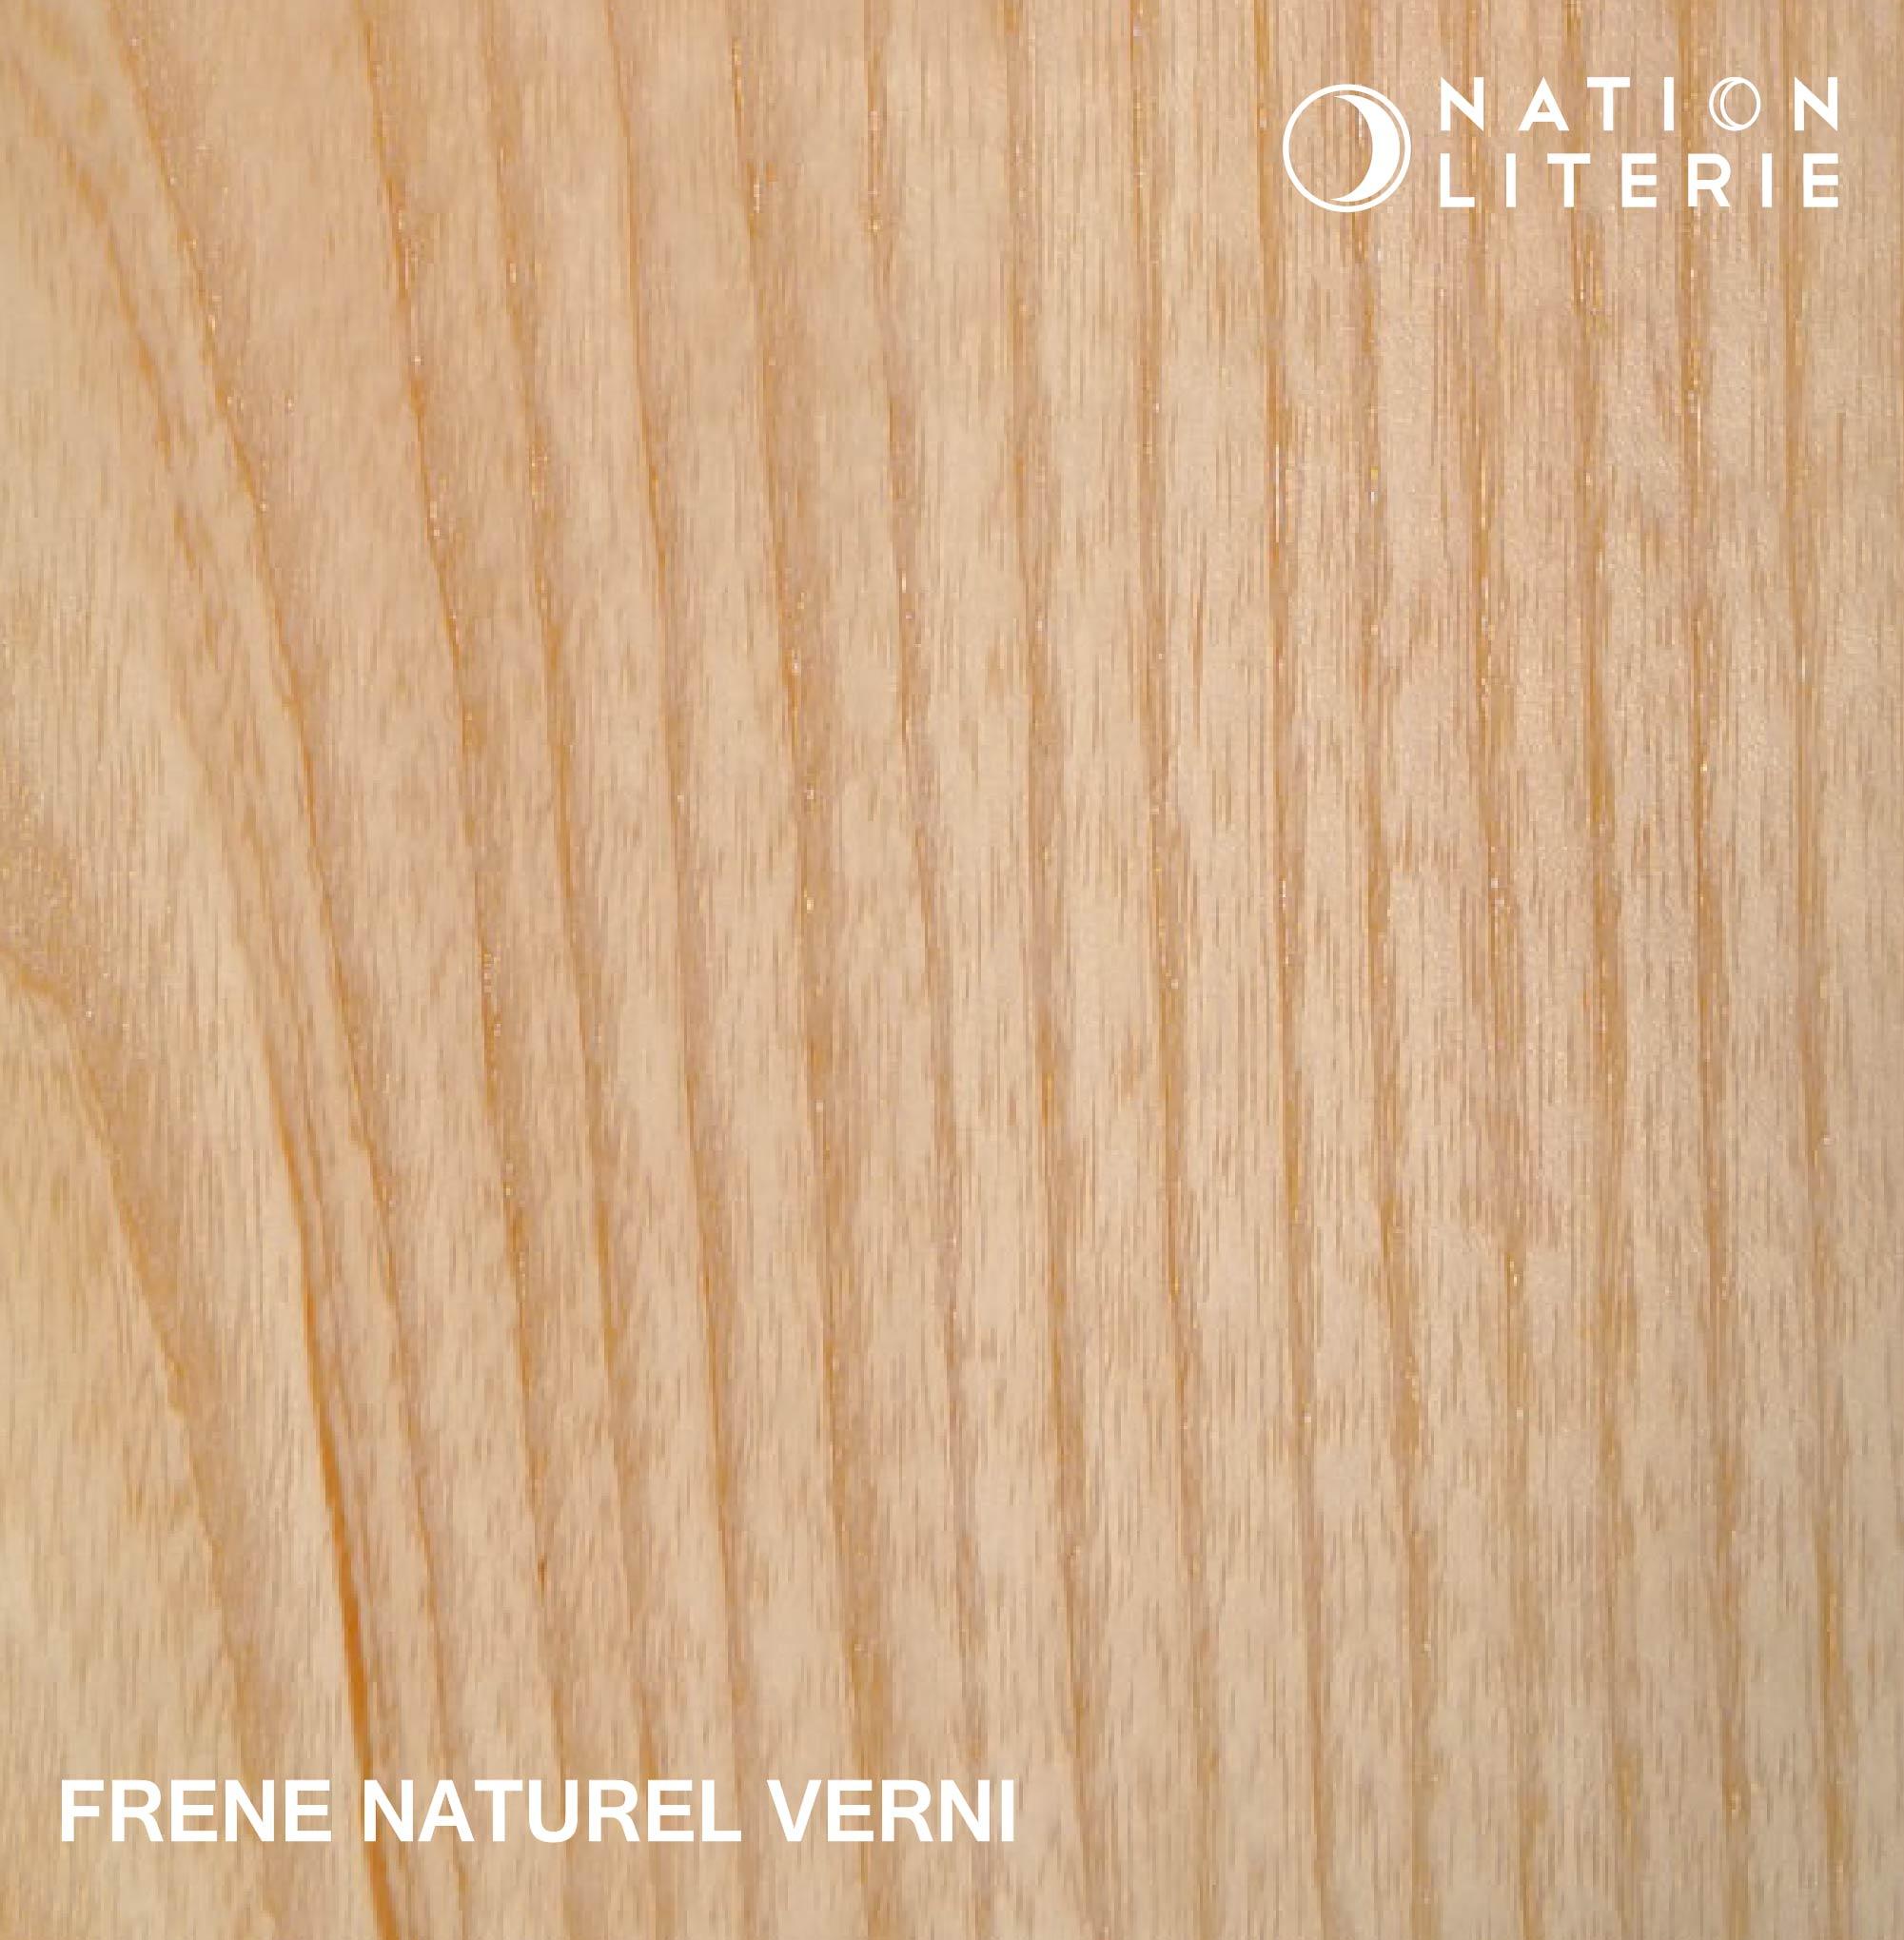 Frêne naturel vernis